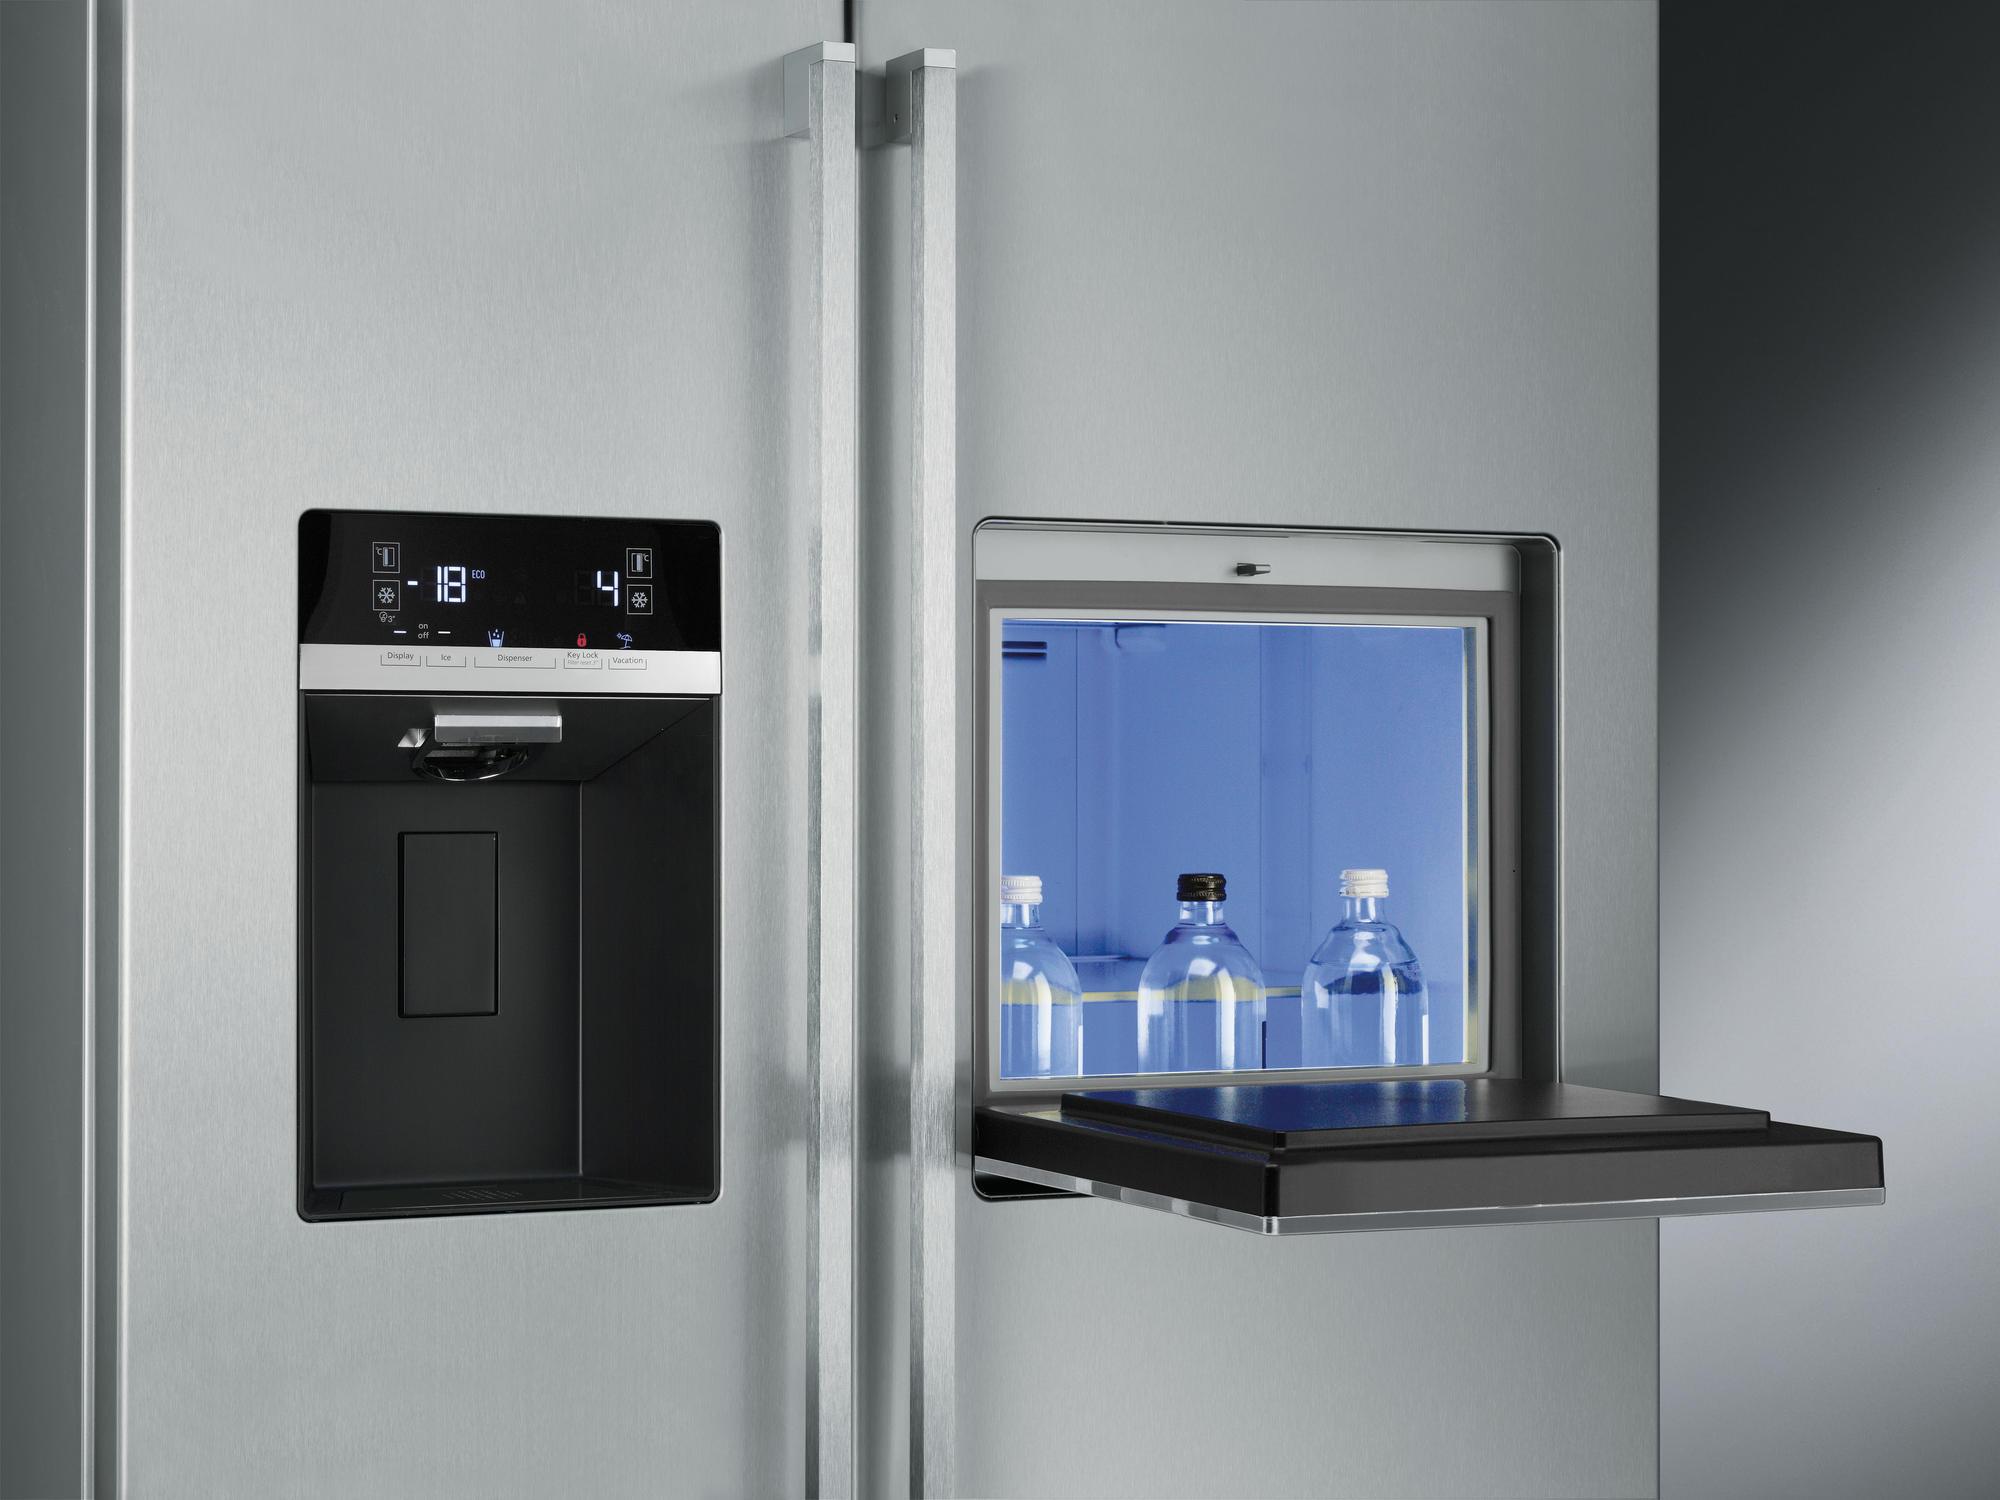 Smeg Kühlschrank French Door : Smeg kühlschrank side by side sbs xedh cm welter welter köln